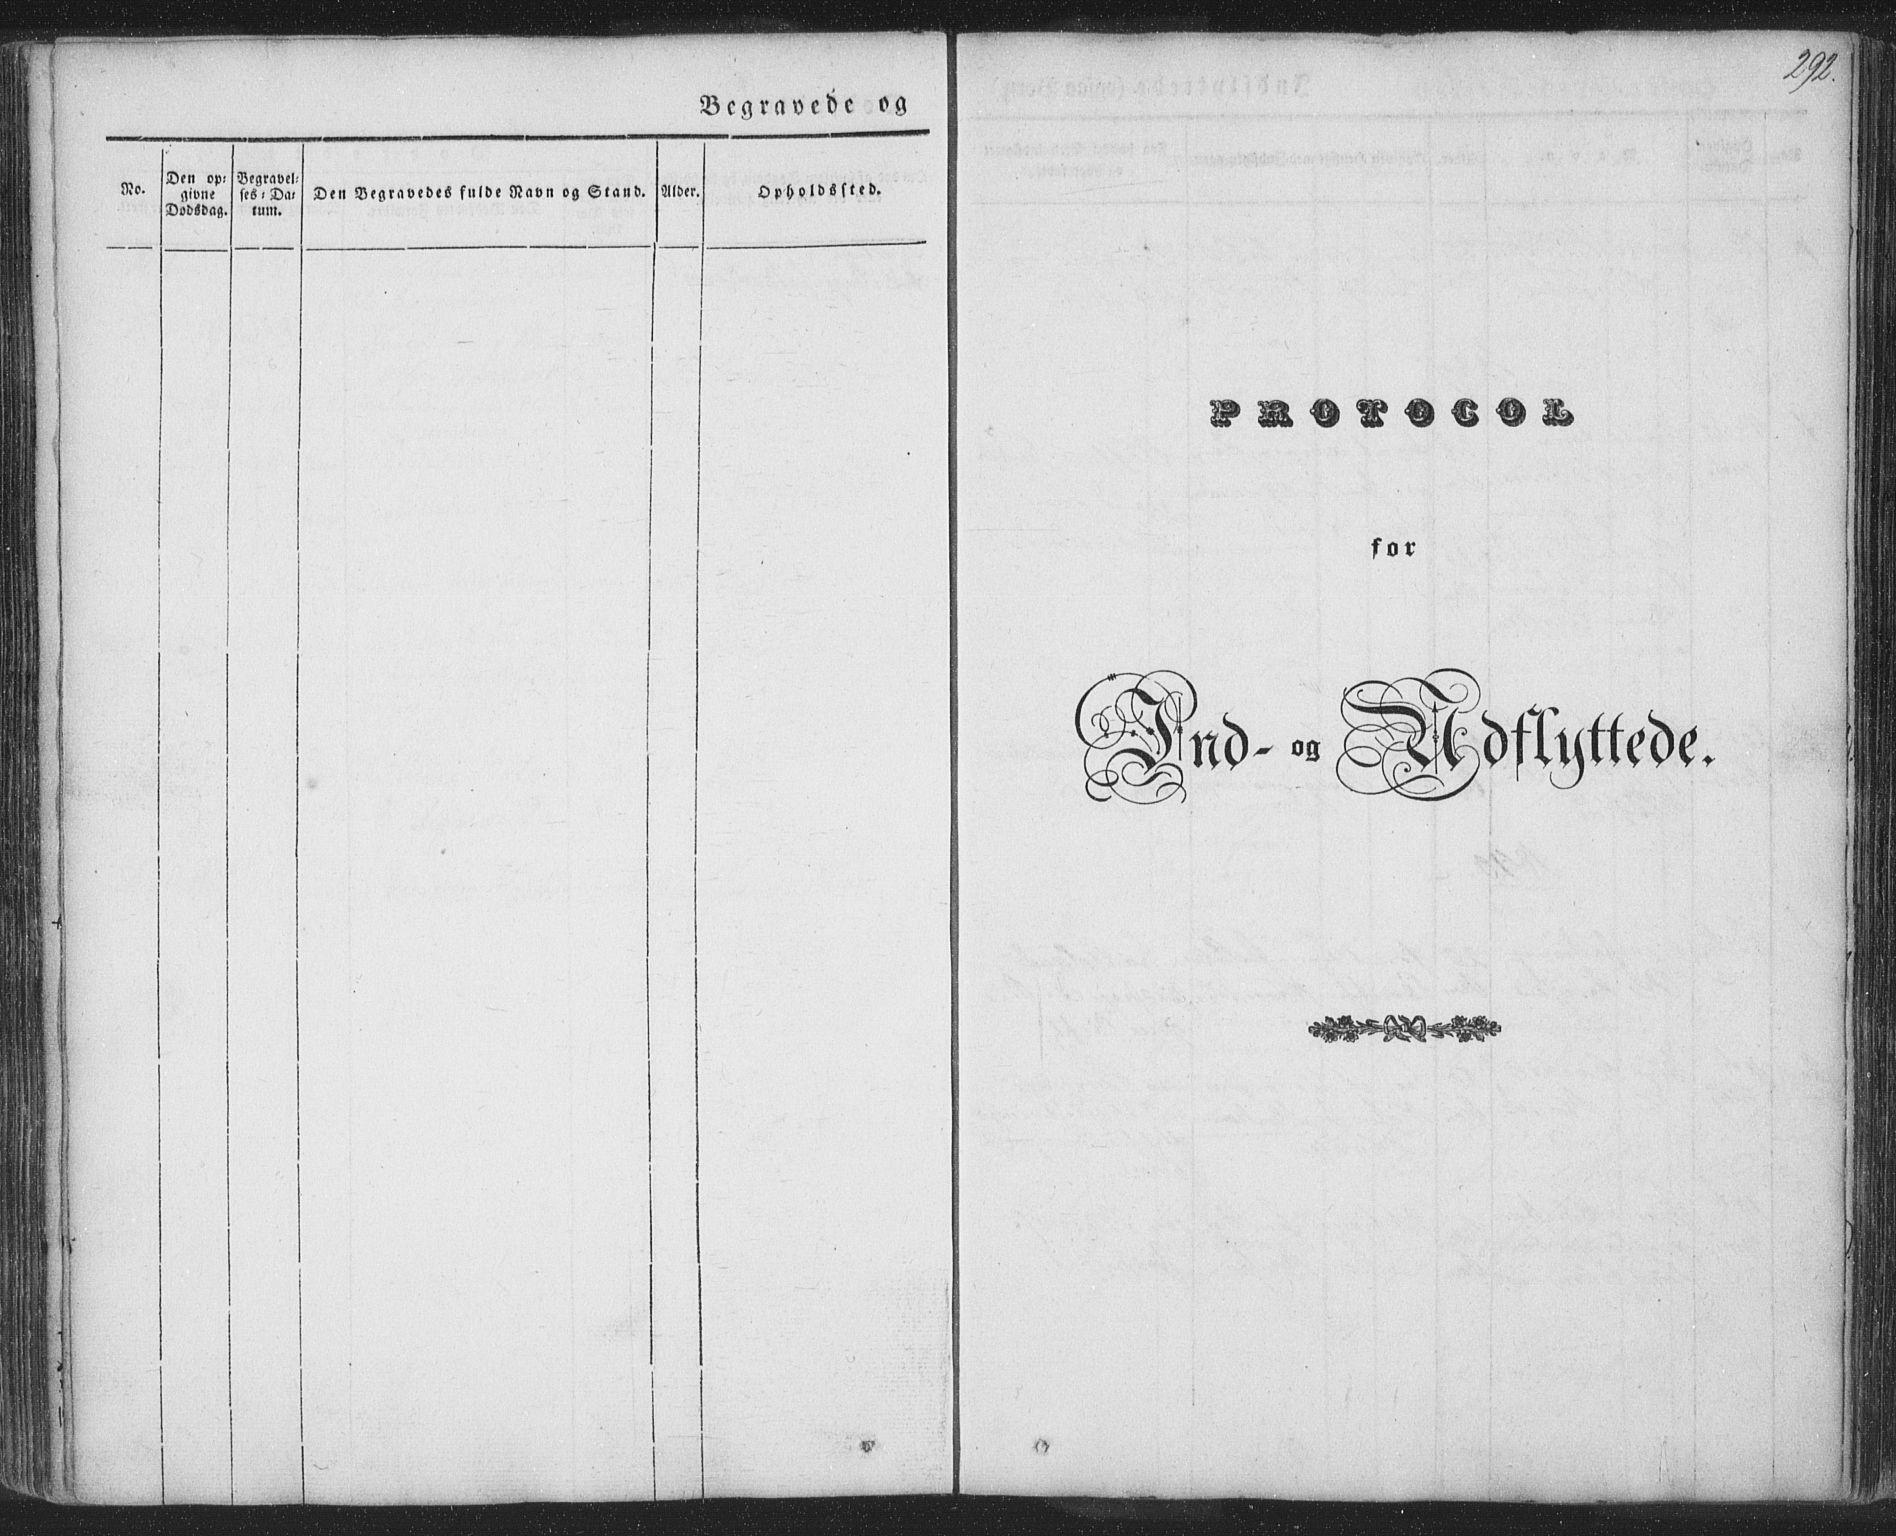 SAT, Ministerialprotokoller, klokkerbøker og fødselsregistre - Nordland, 885/L1202: Ministerialbok nr. 885A03, 1838-1859, s. 292